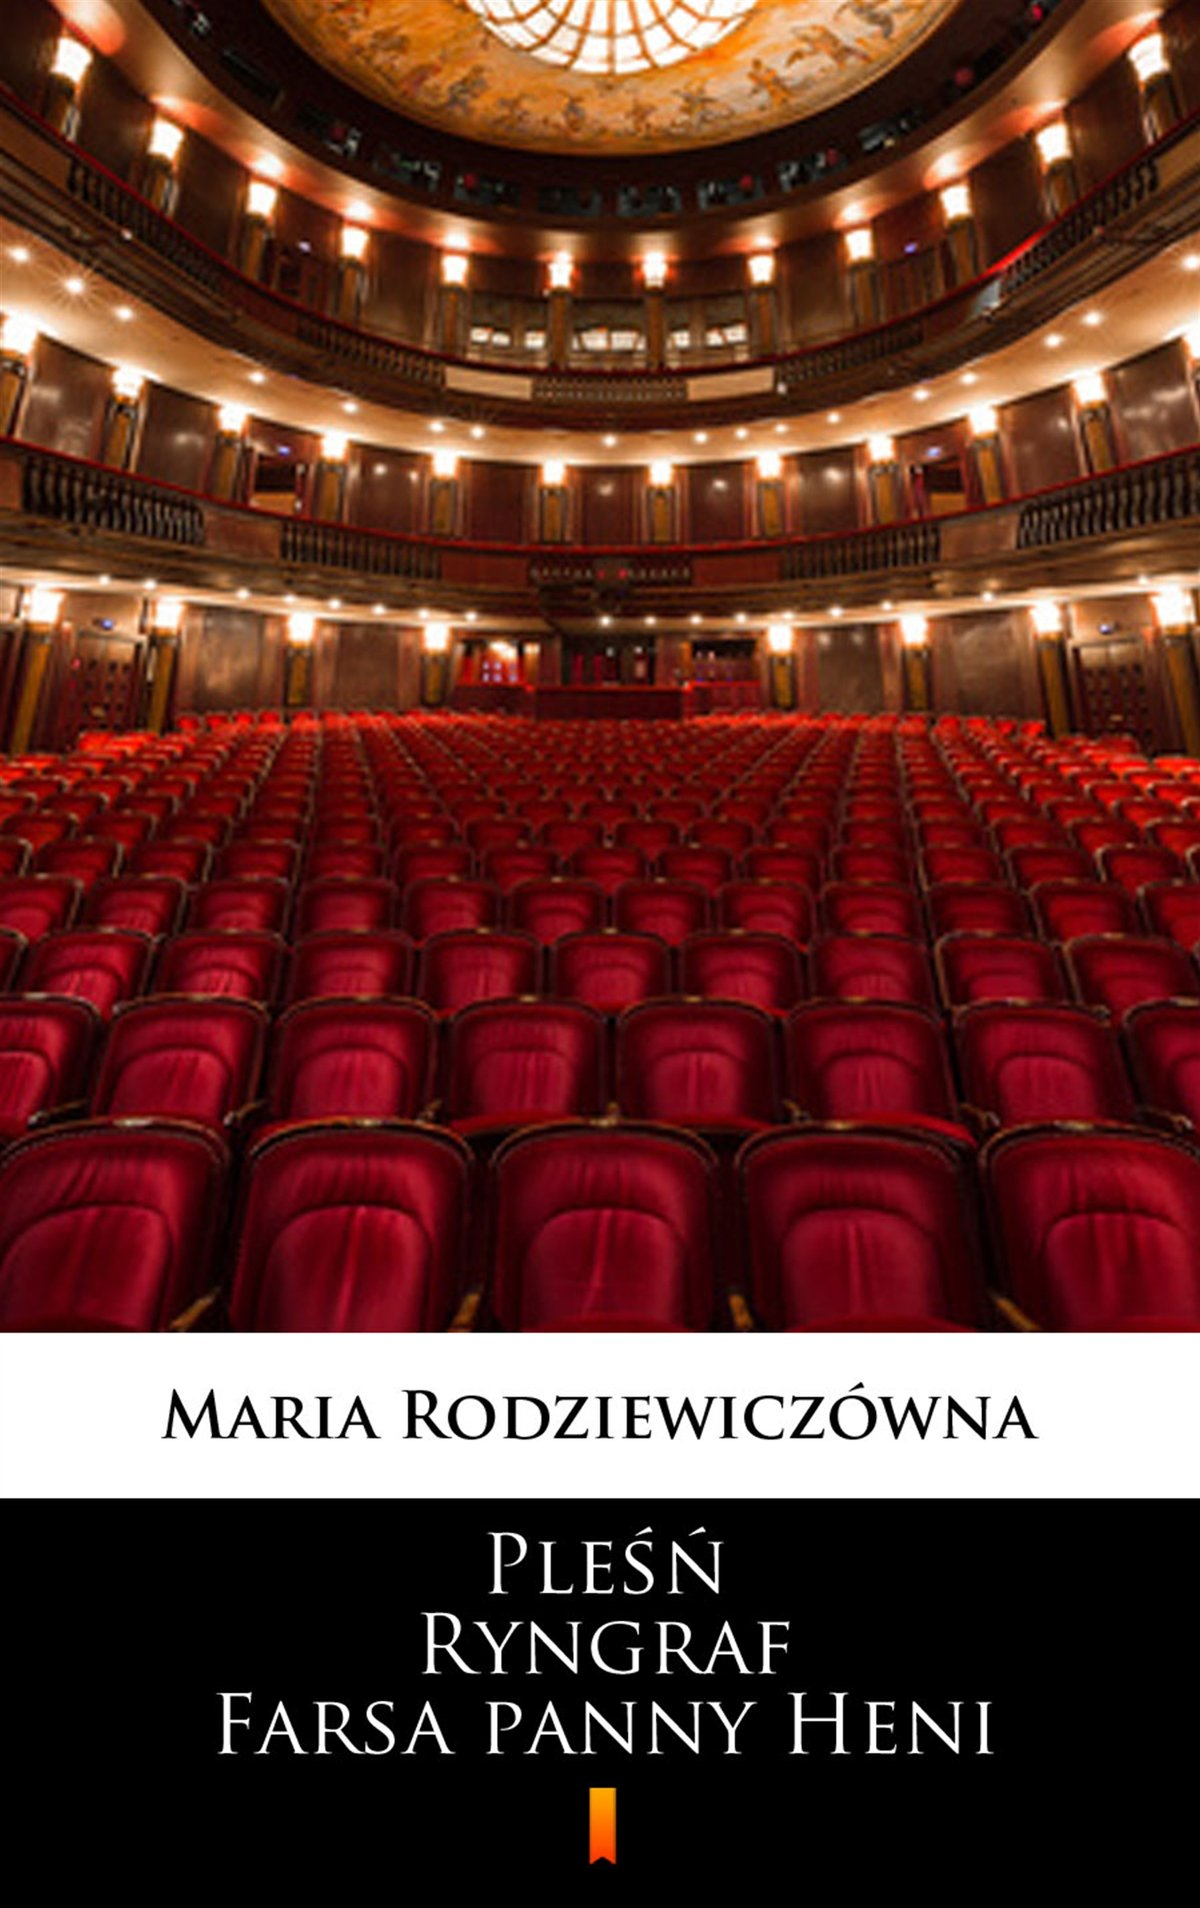 Pleśń. Ryngraf. Farsa panny Heni - Ebook (Książka EPUB) do pobrania w formacie EPUB